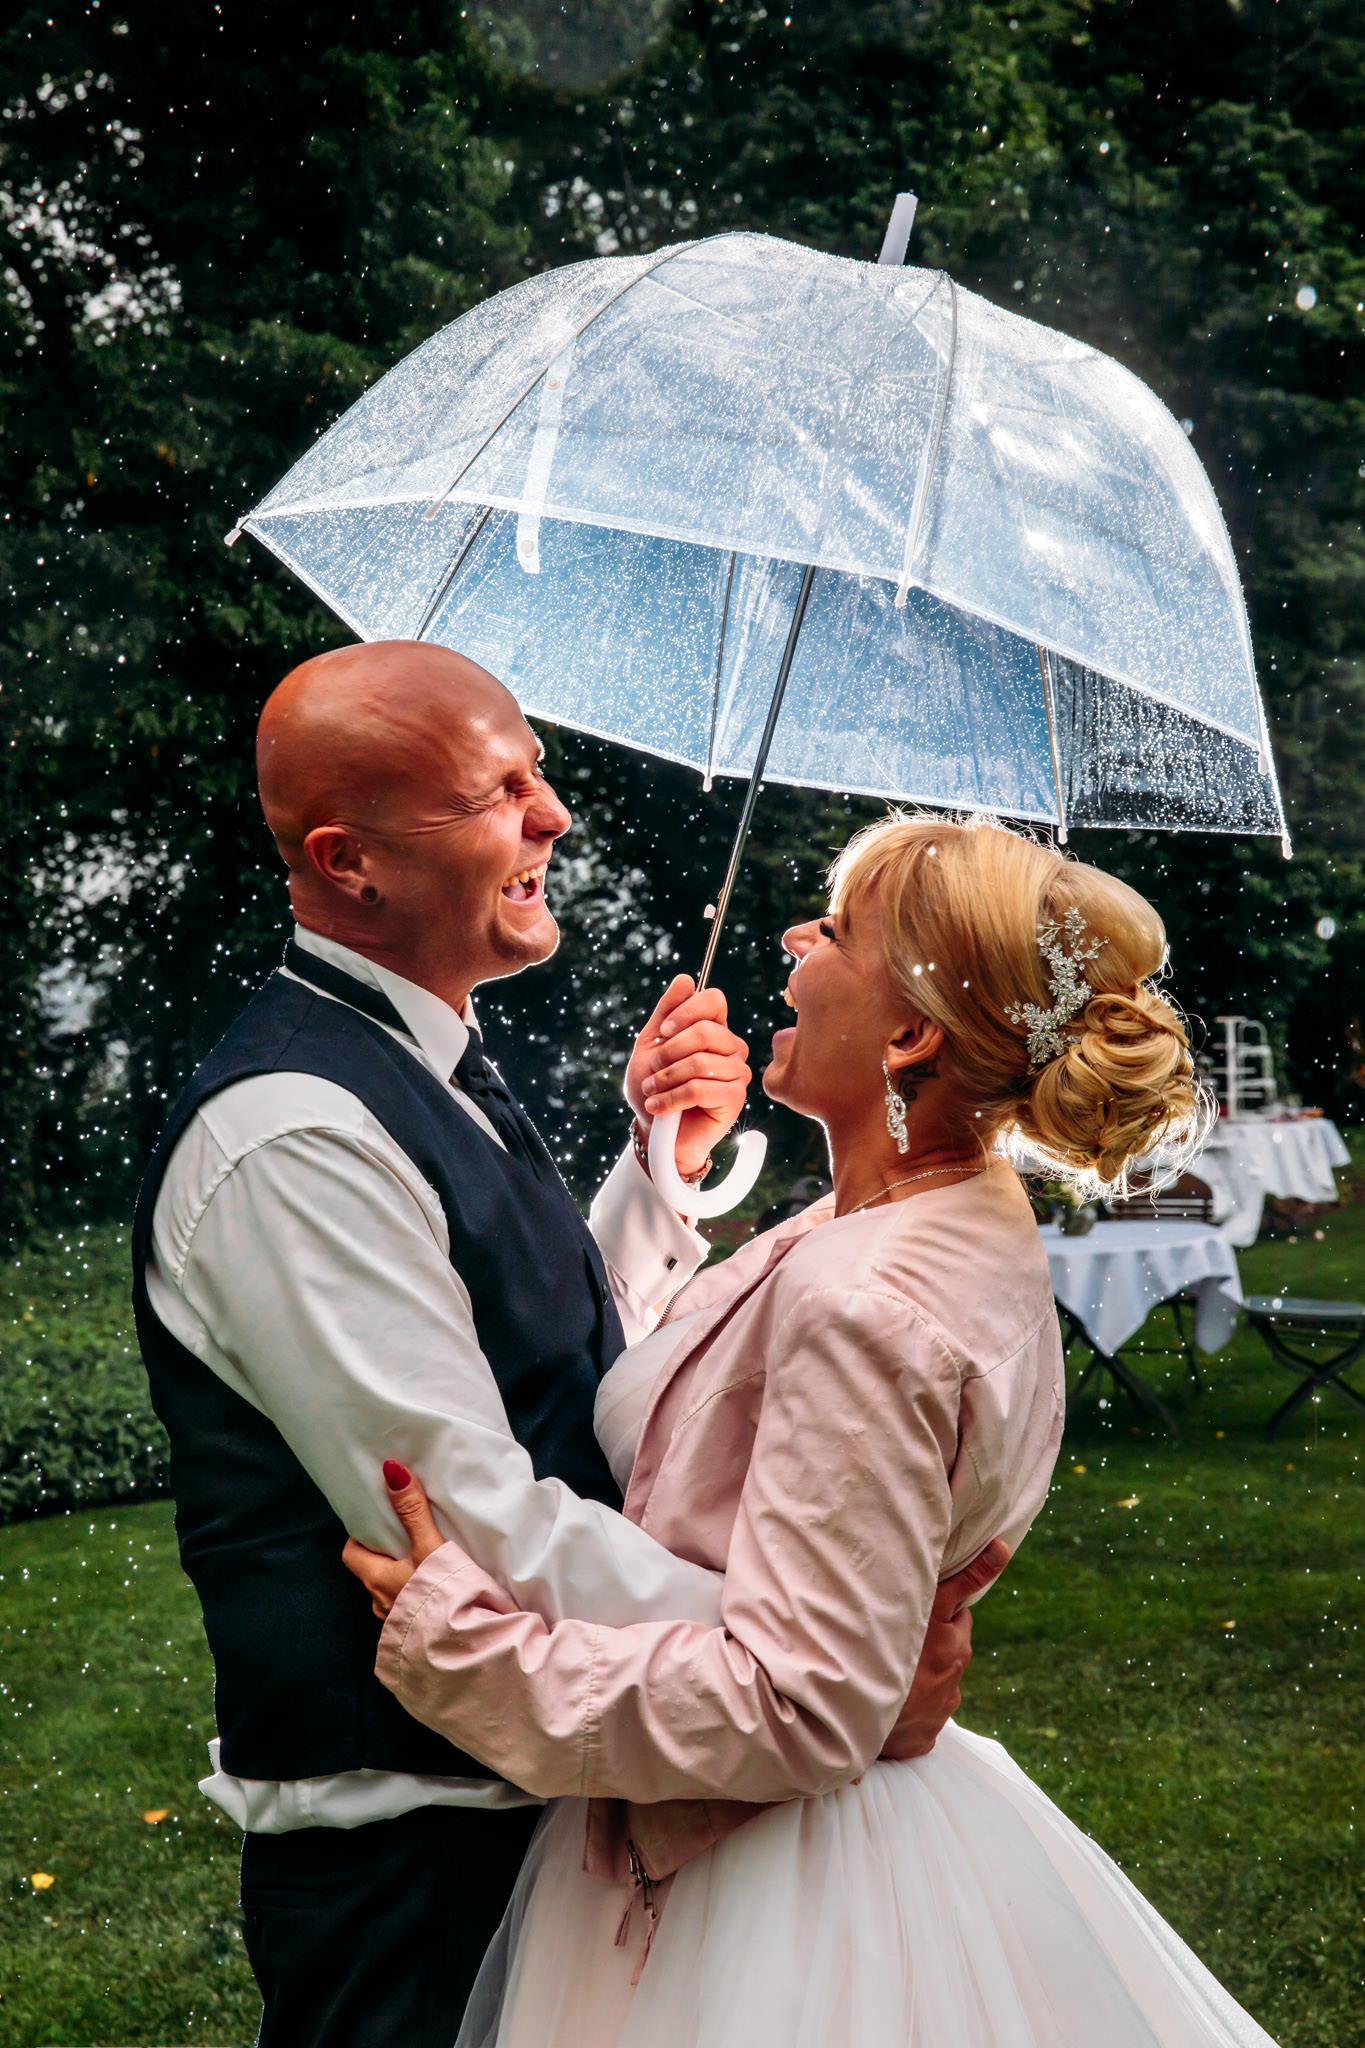 190531_Hochzeit_Potsdam_Schloss_Gut_Golm_Vorschau_web_0025.jpg